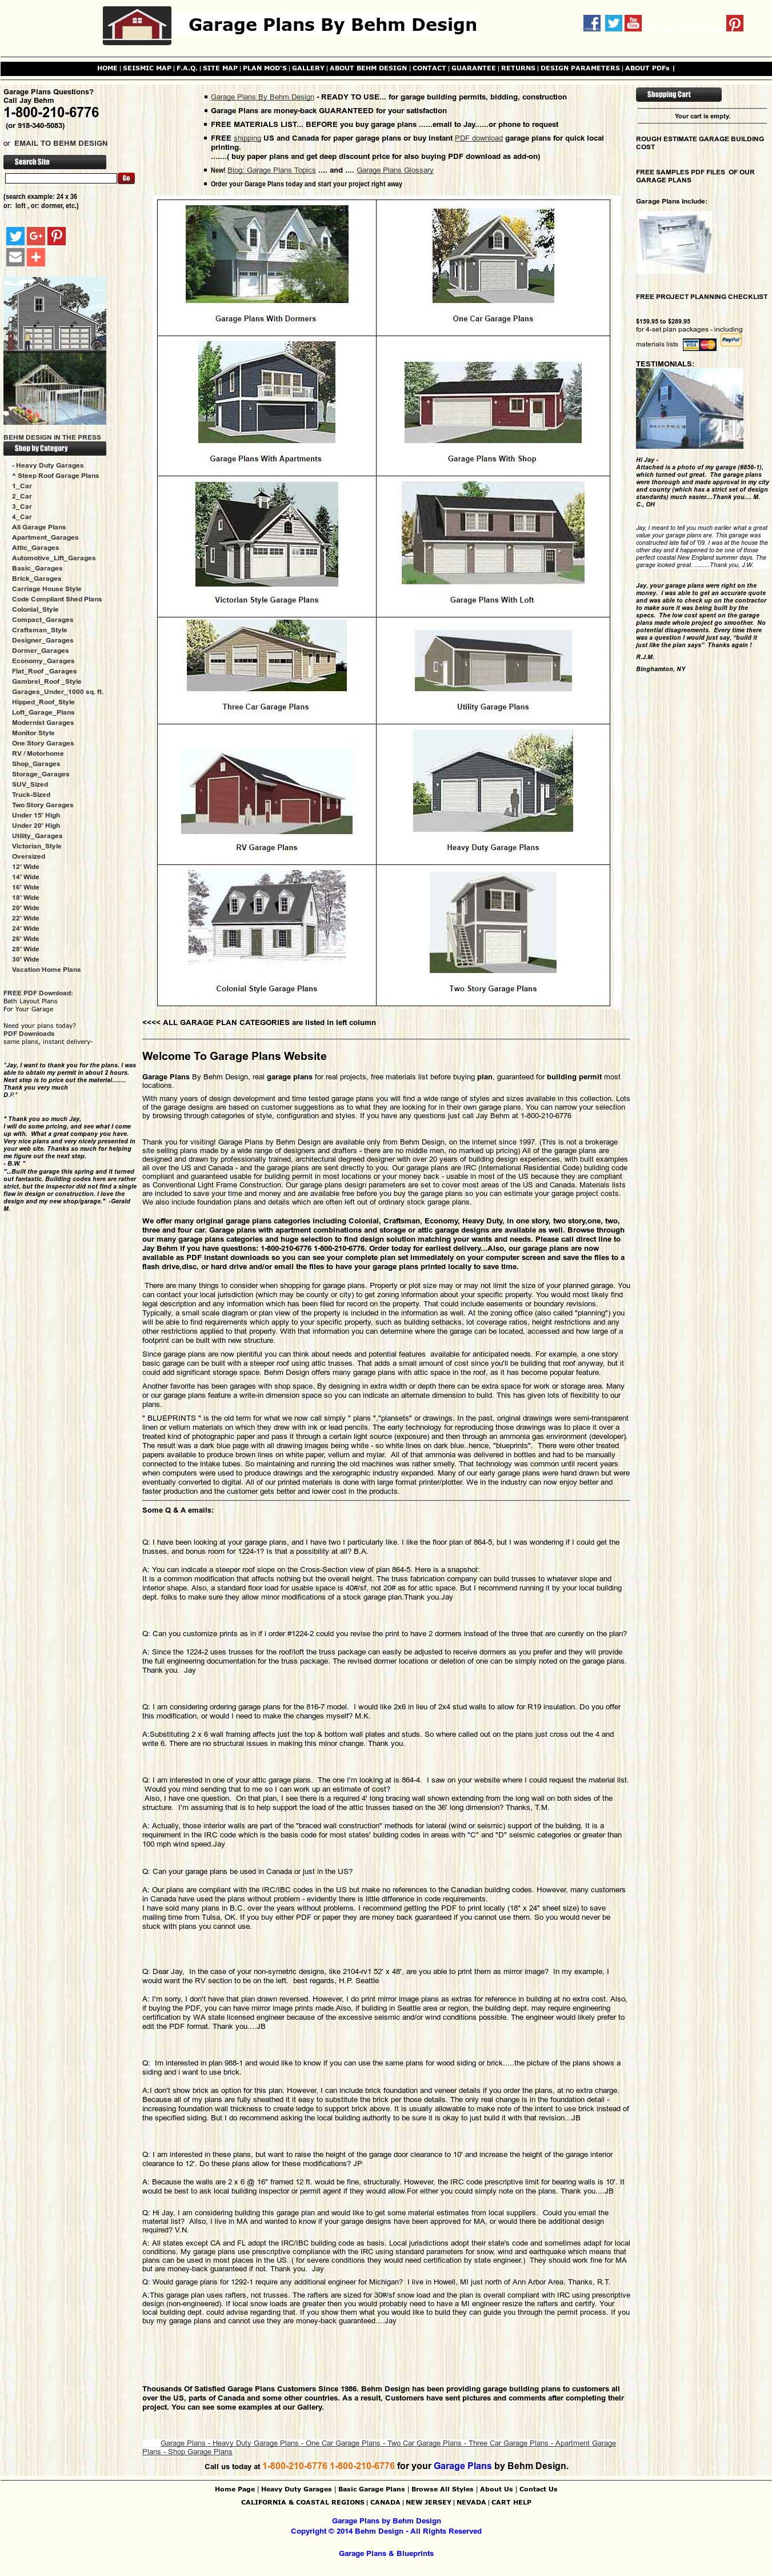 Behm Design Competitors, Revenue and Employees - Owler Company Profile